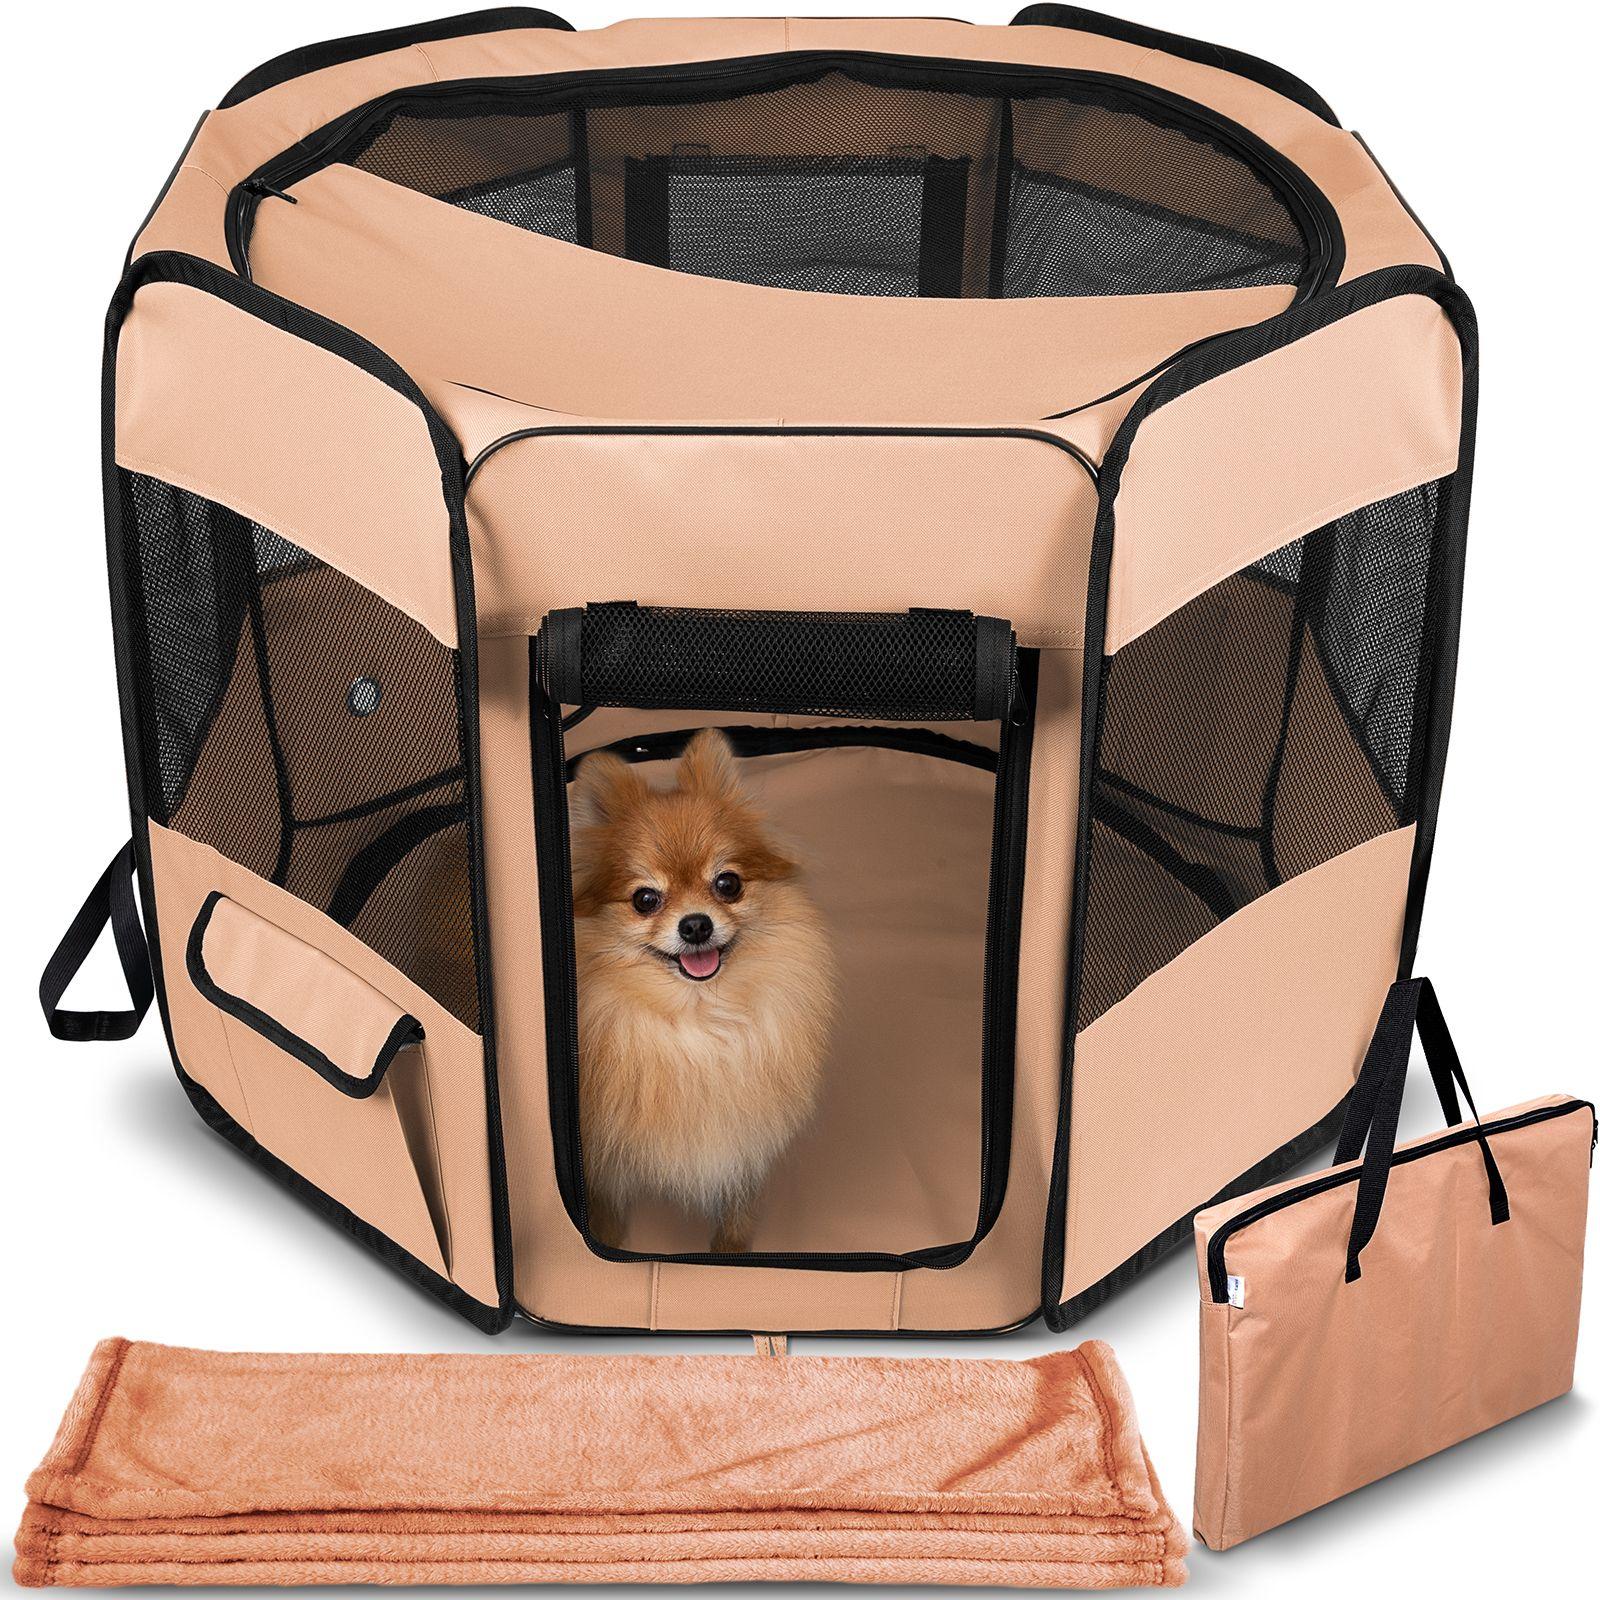 Paws pals dog playpen softsided mesh portable foldable